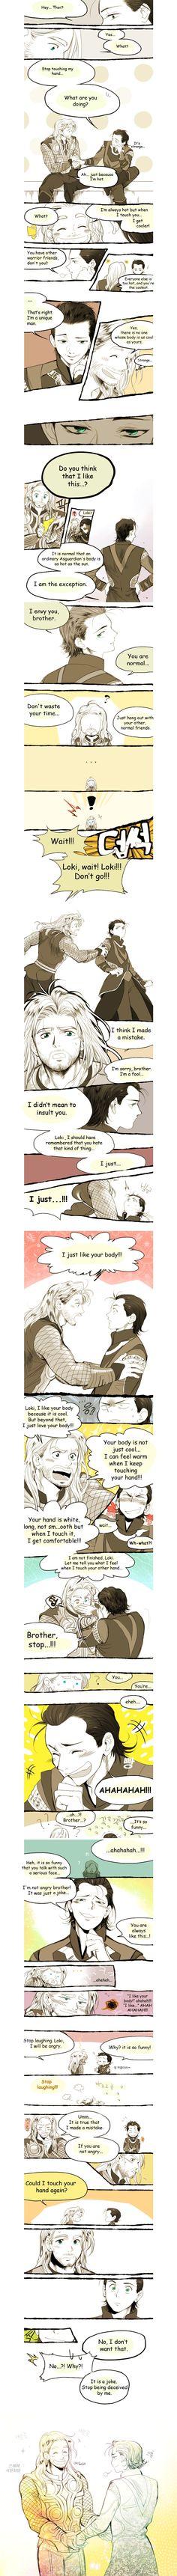 Thor and Loki - comic